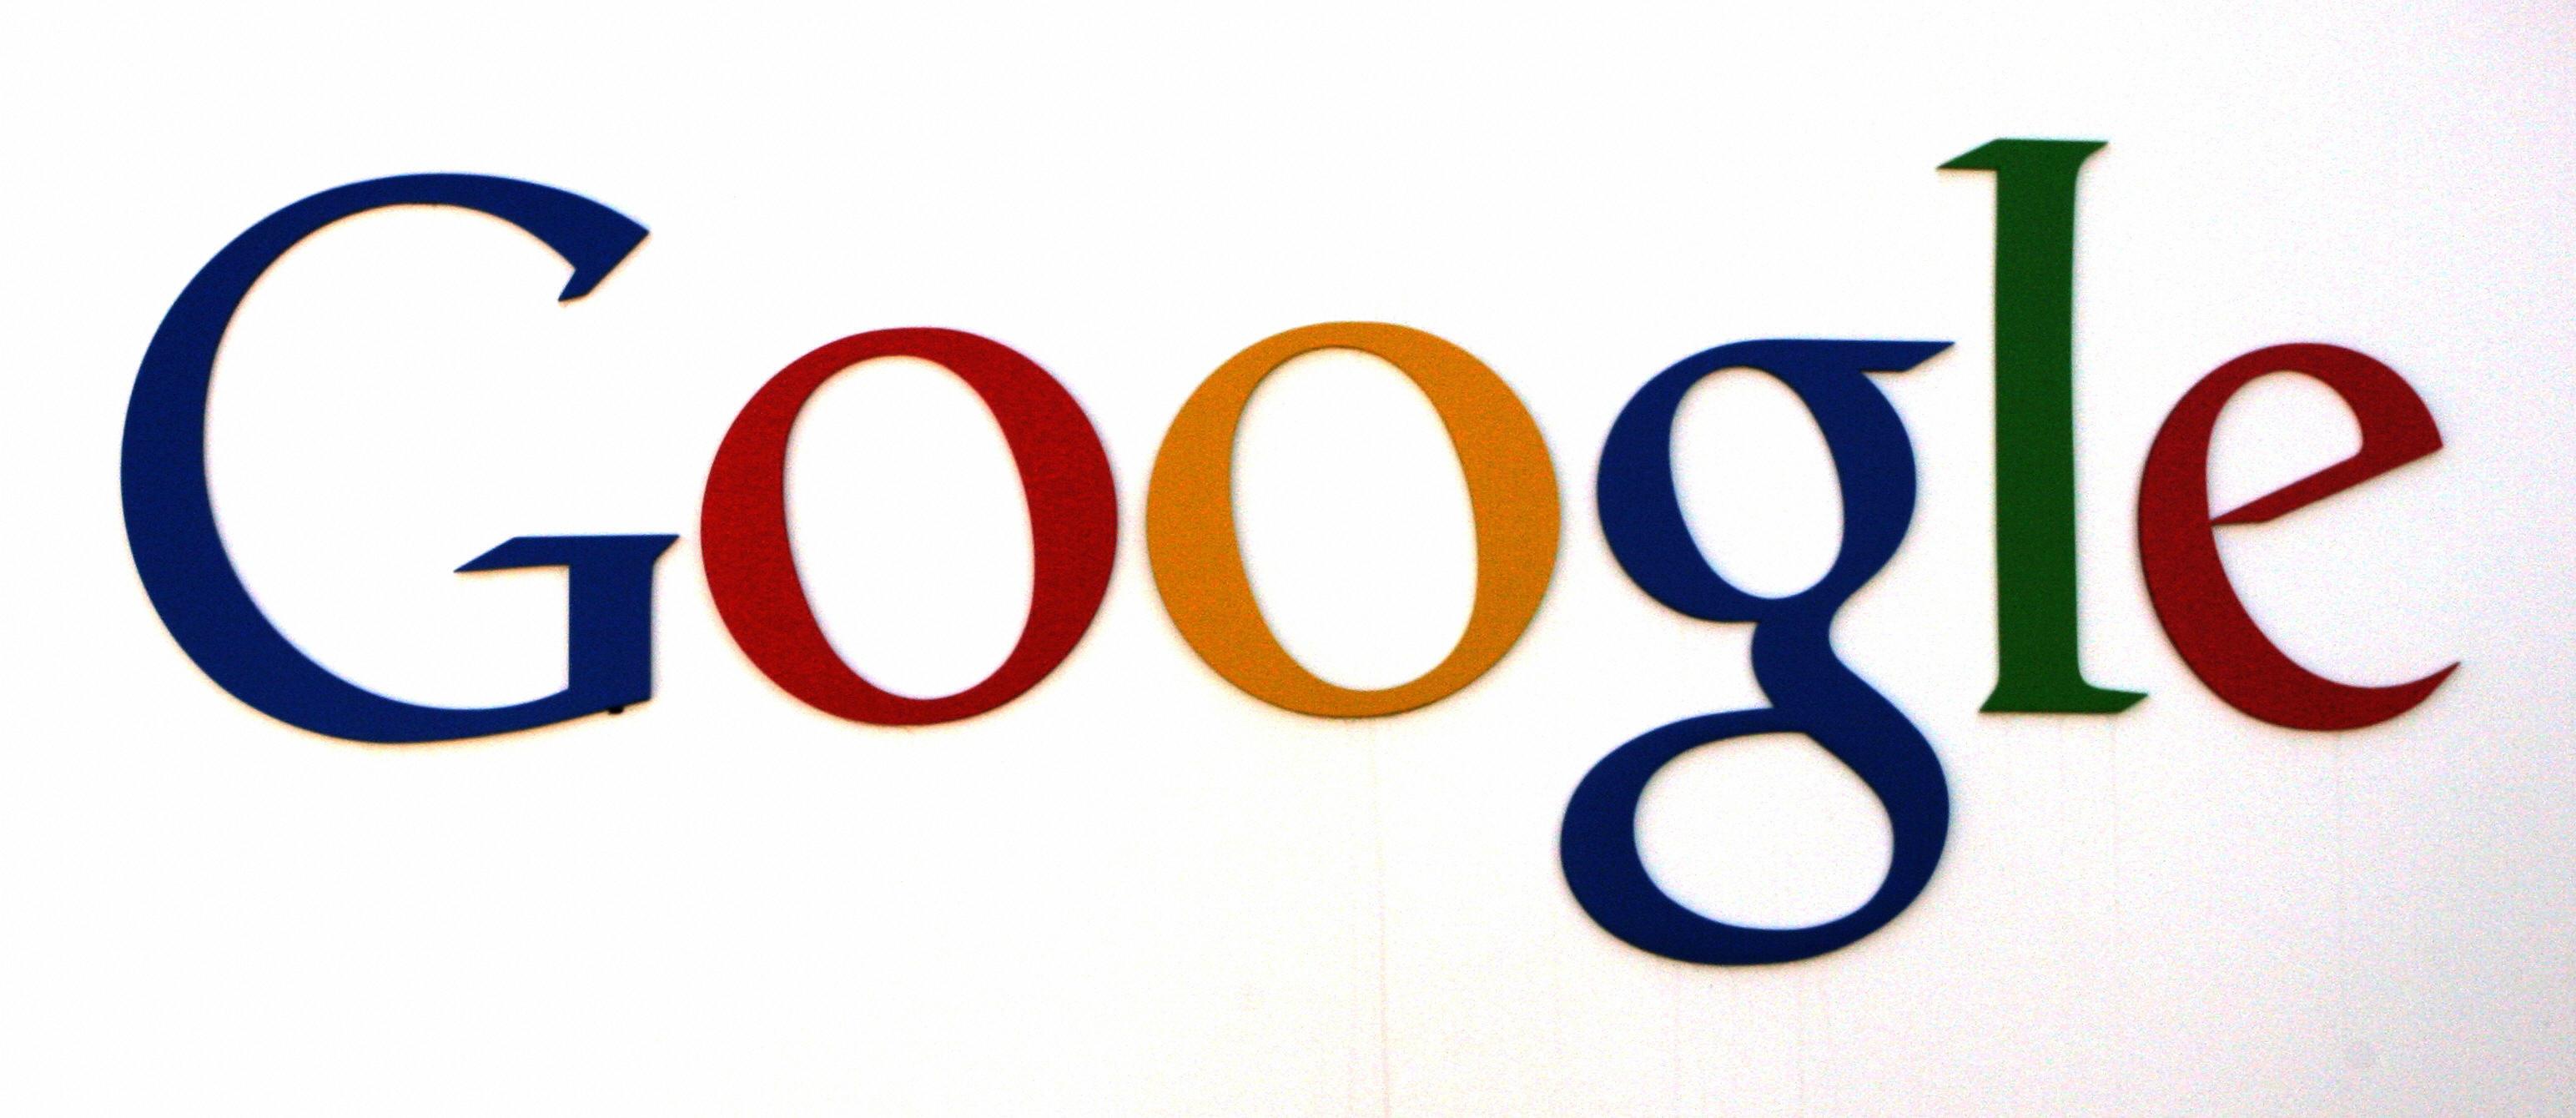 how to delete borders in google docs